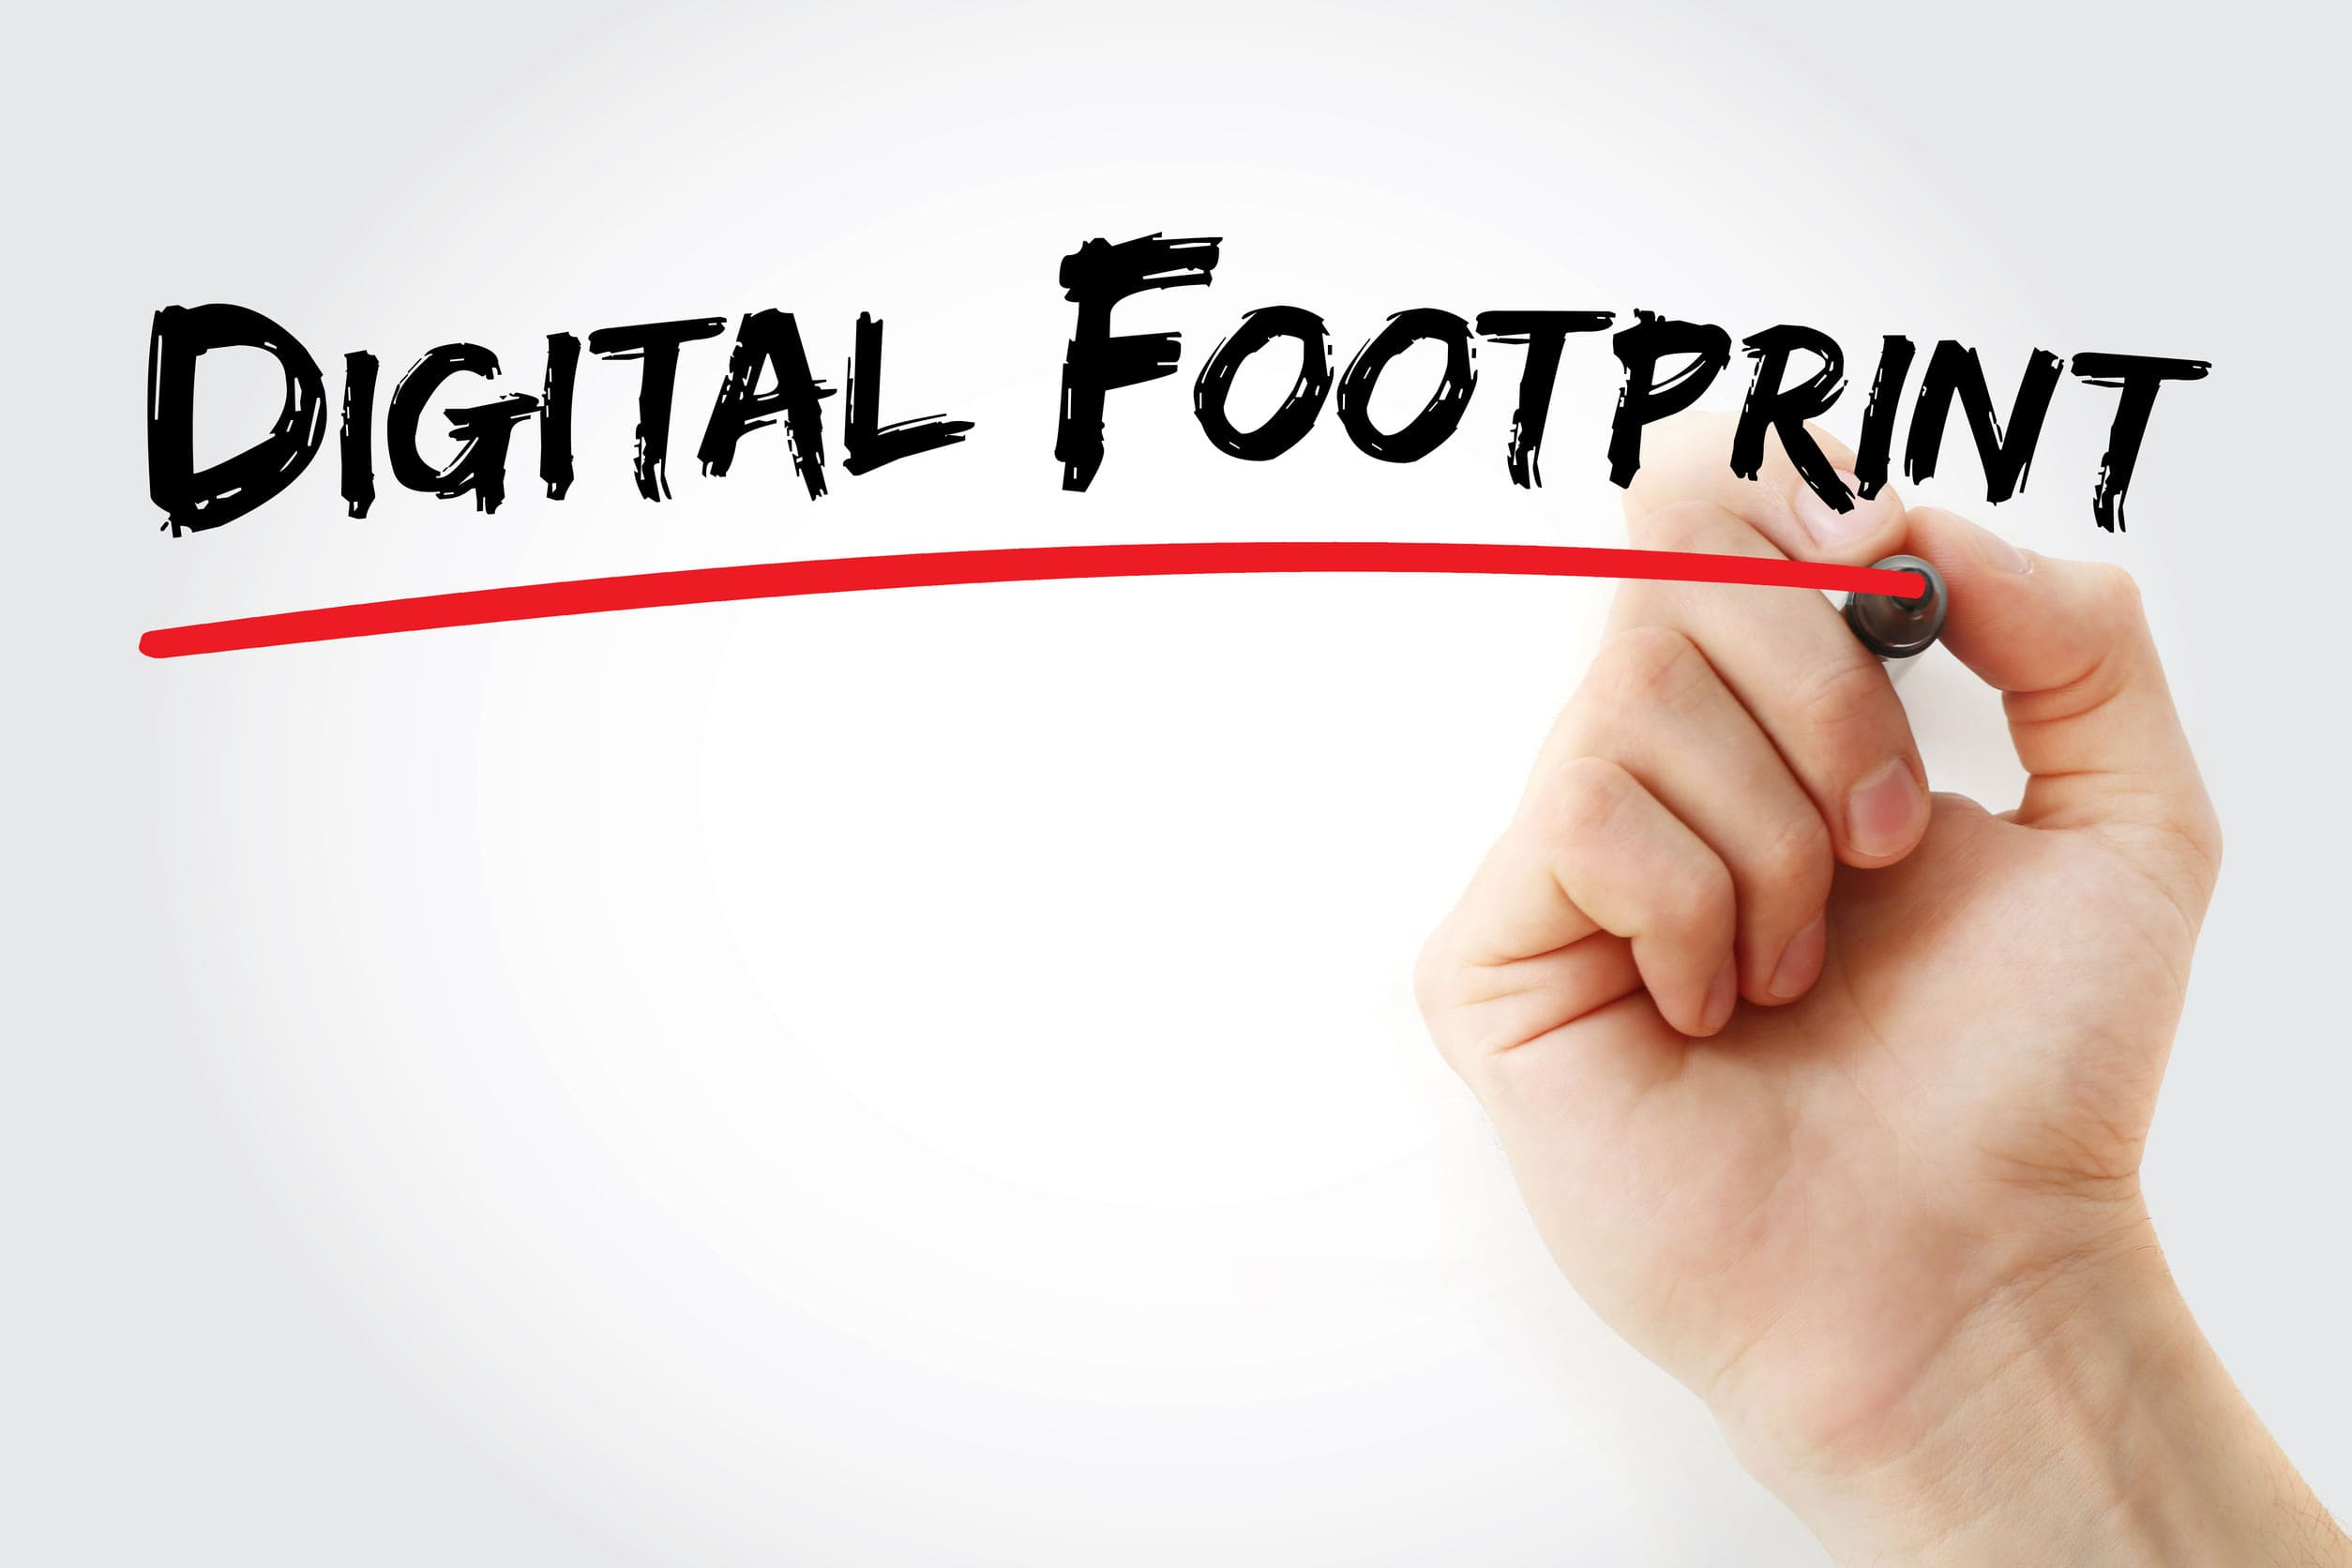 Securing a Digital Footprint